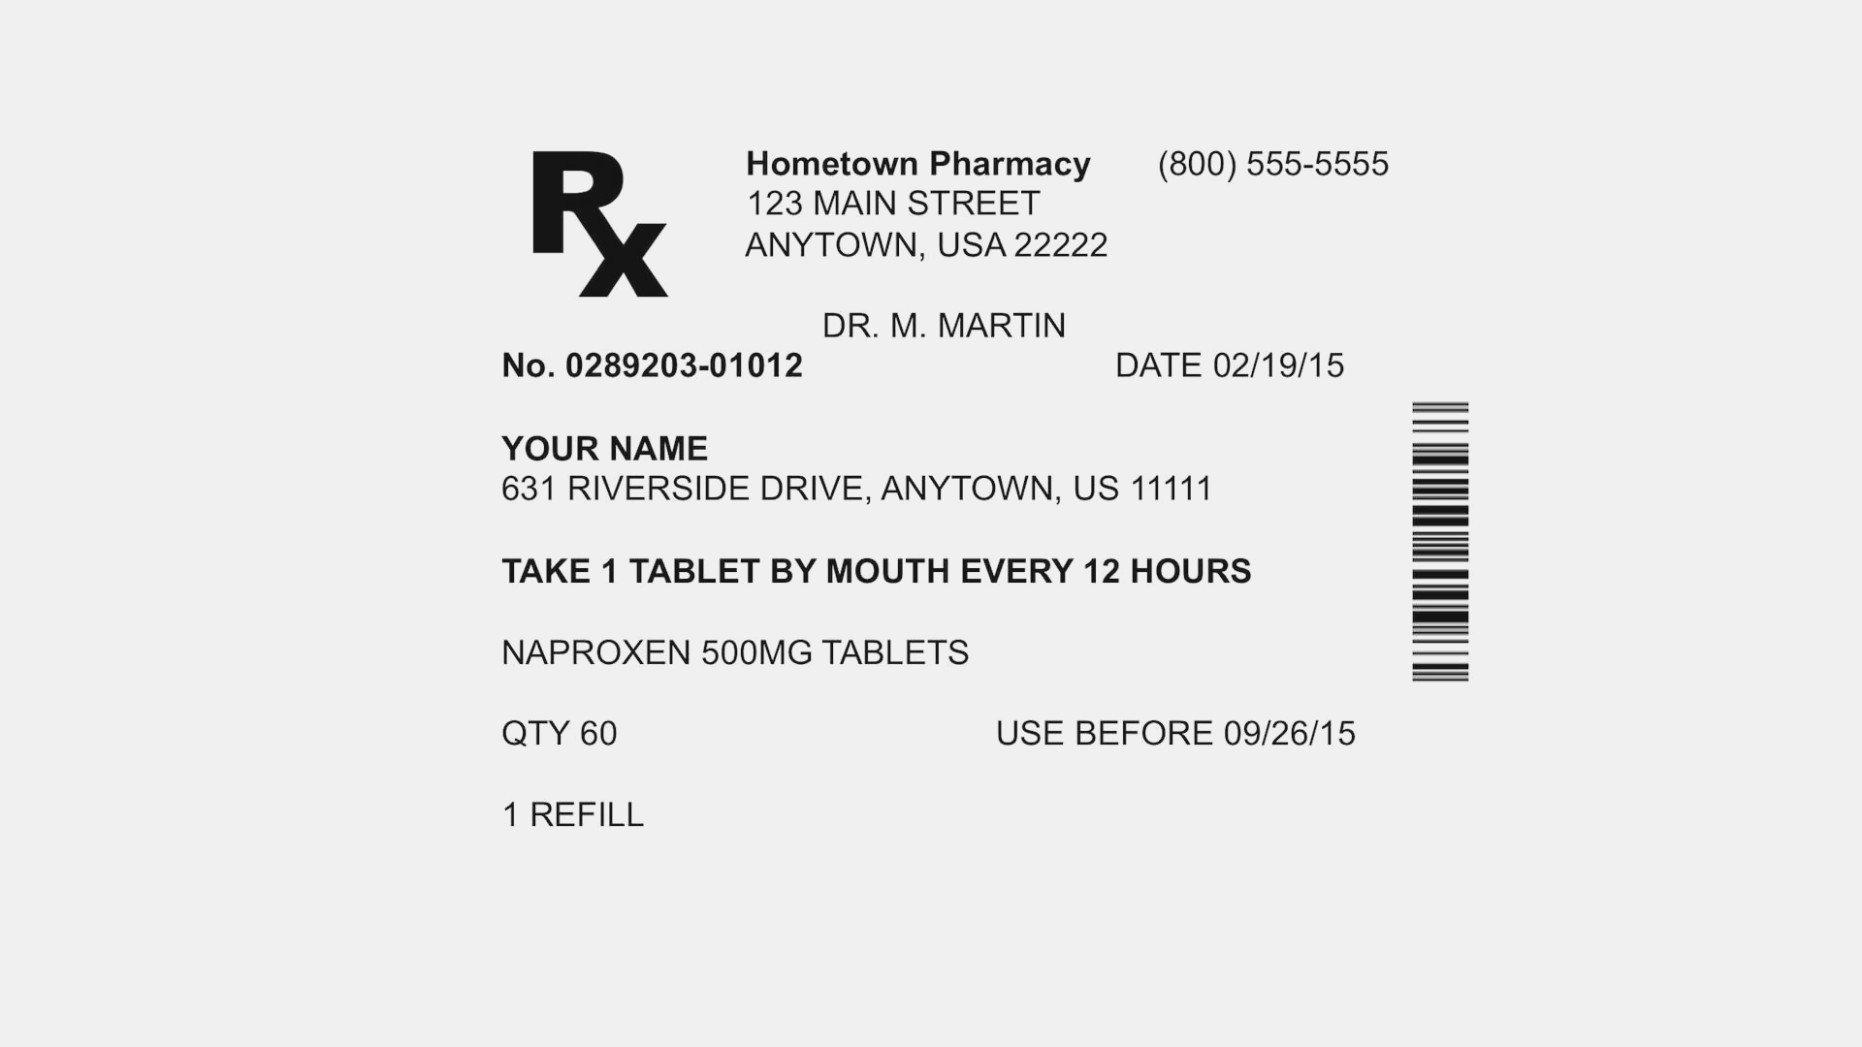 Prescription Bottle Label Generator 10 top Risks Pill Bottle Label Maker